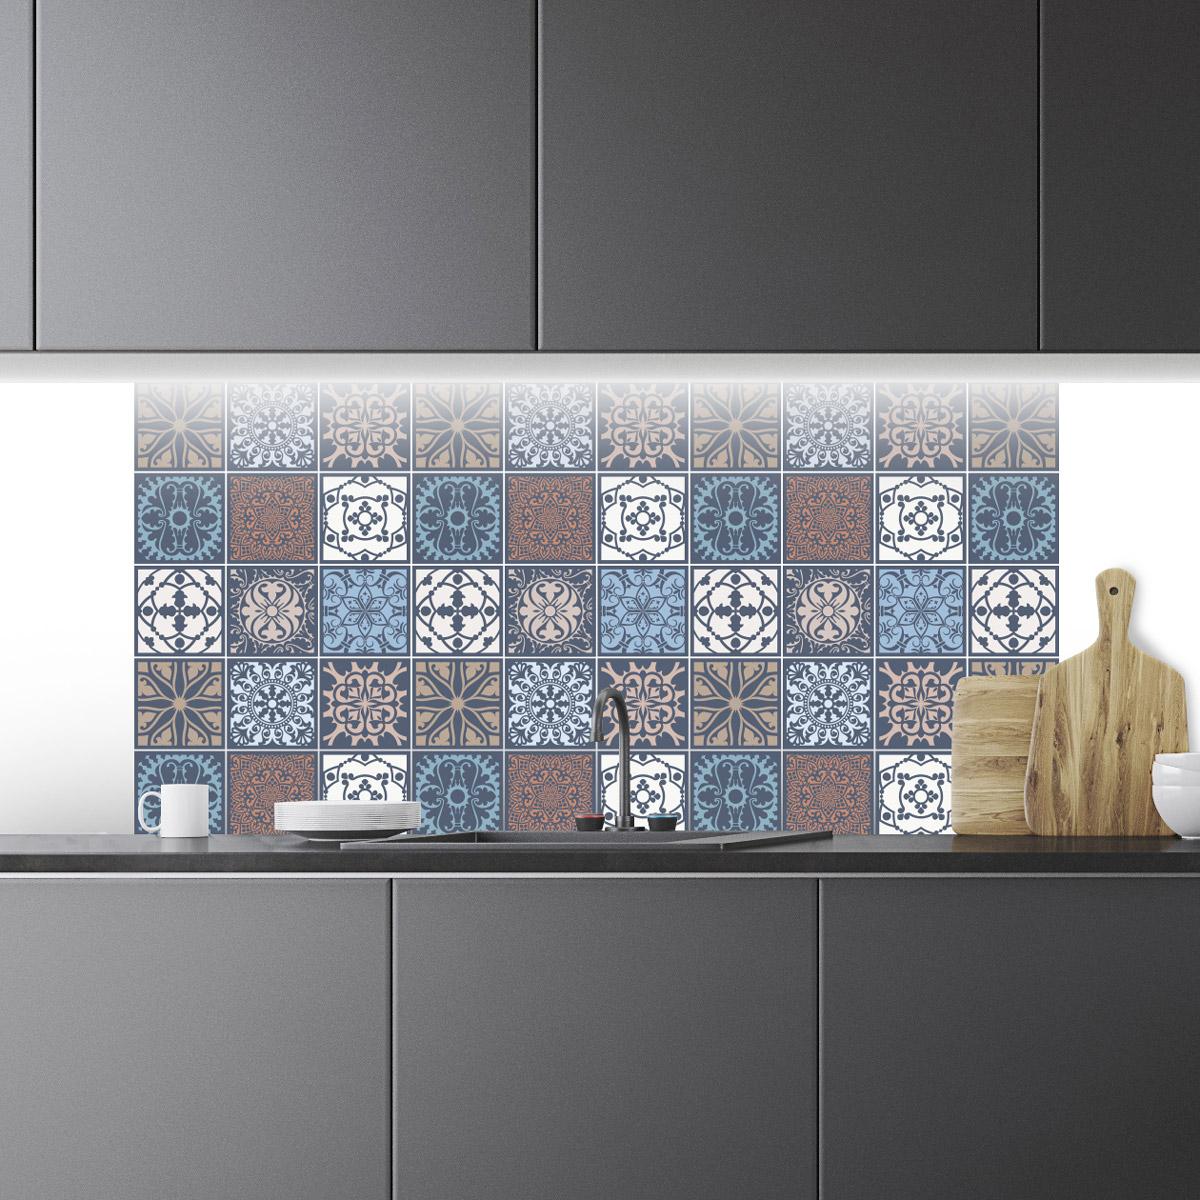 60 stickers carrelages azulejos ornements artistique art. Black Bedroom Furniture Sets. Home Design Ideas